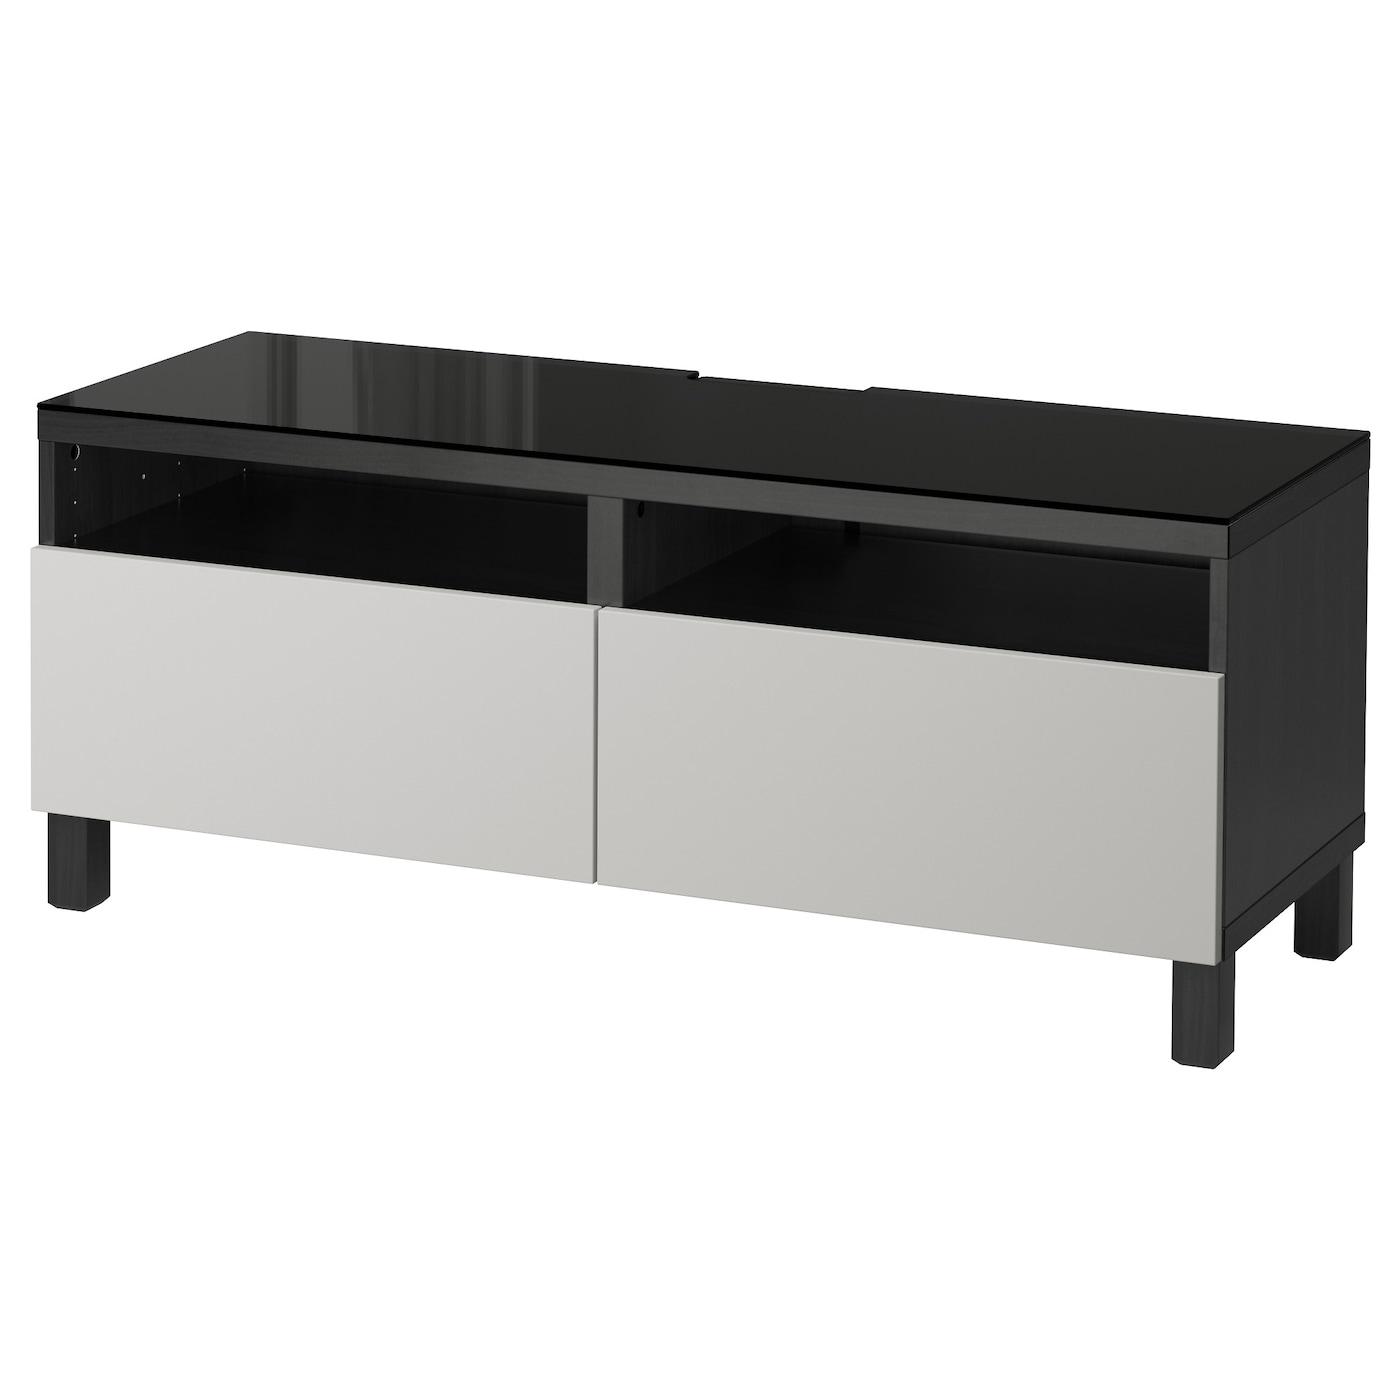 Best Tv Bench With Drawers Black Brown Lappviken Light Grey 120x40x48 Cm Ikea